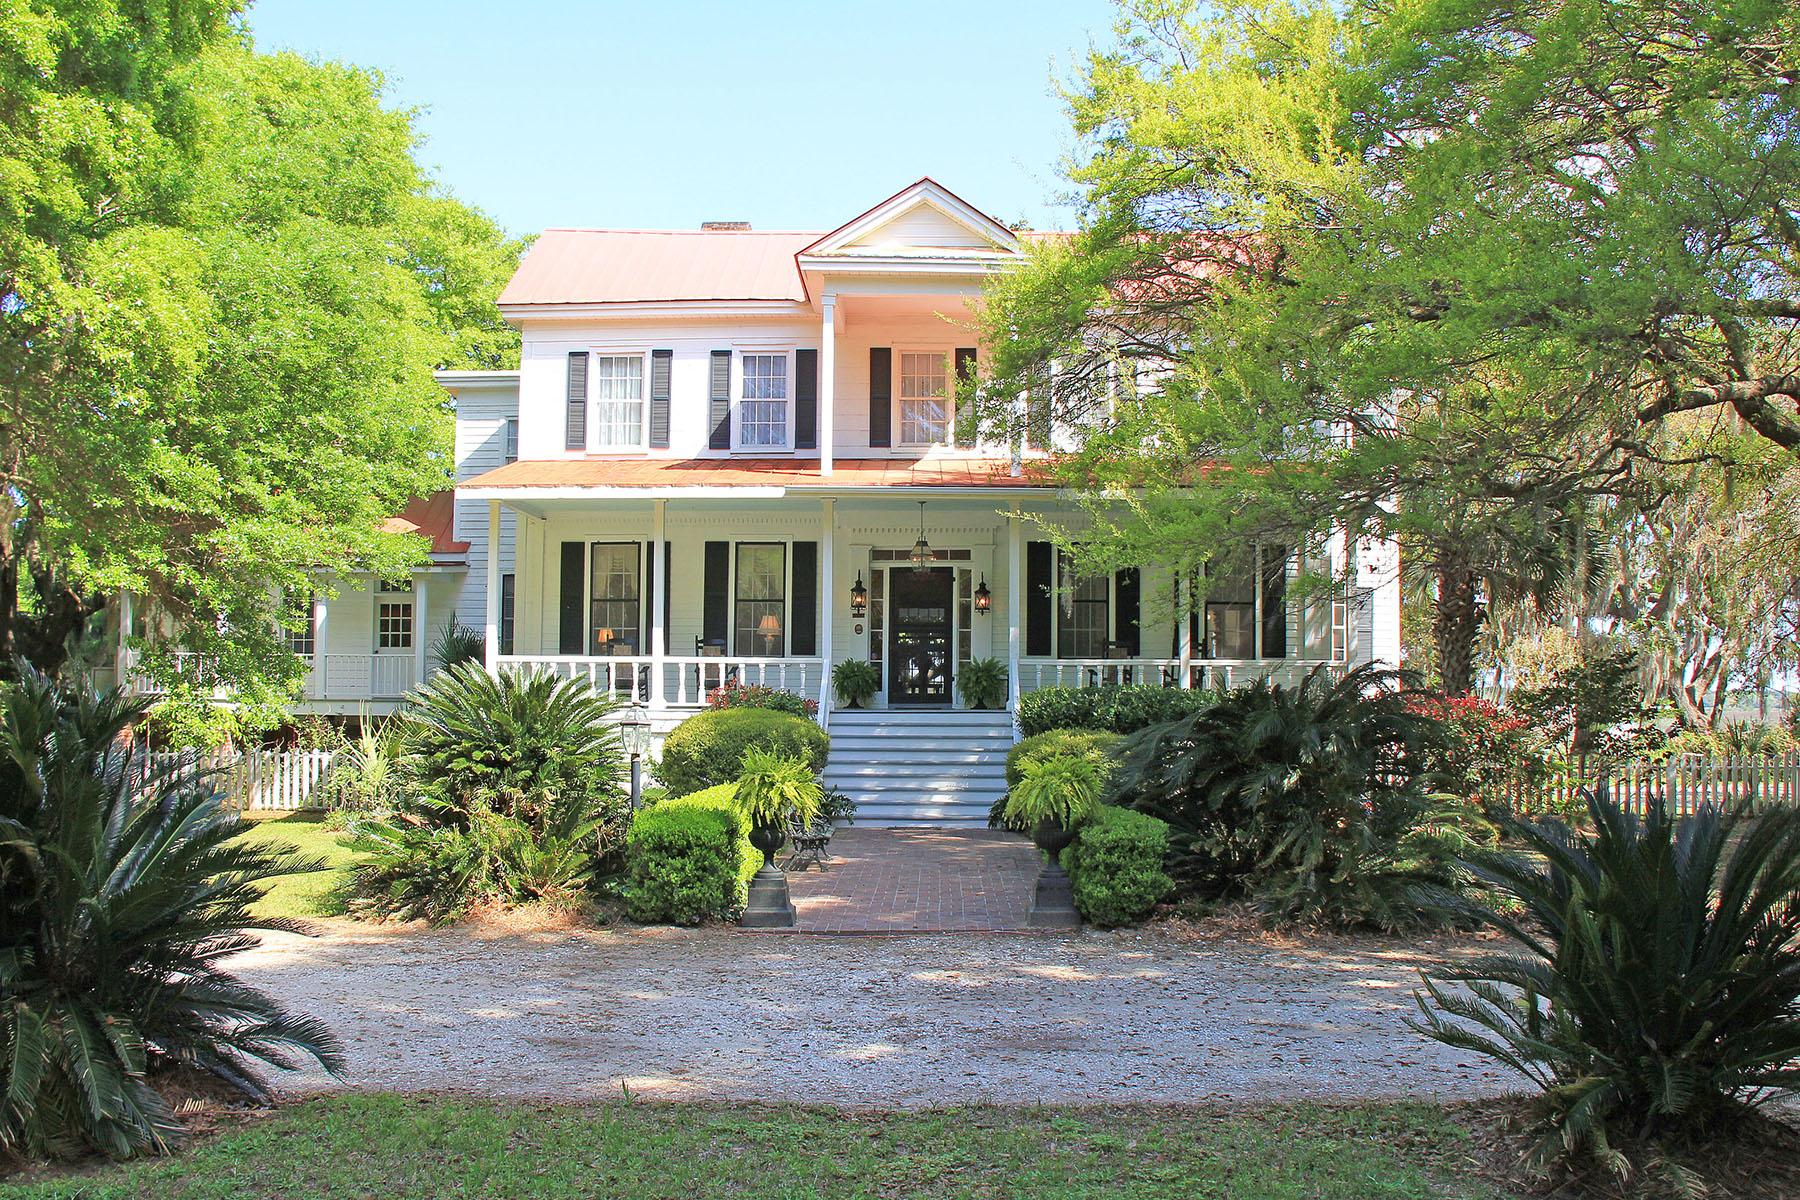 Single Family Home for Sale at Greek Revival Sea Island Residence 66 Godley Road St. Helena Island, South Carolina, 29920 United States